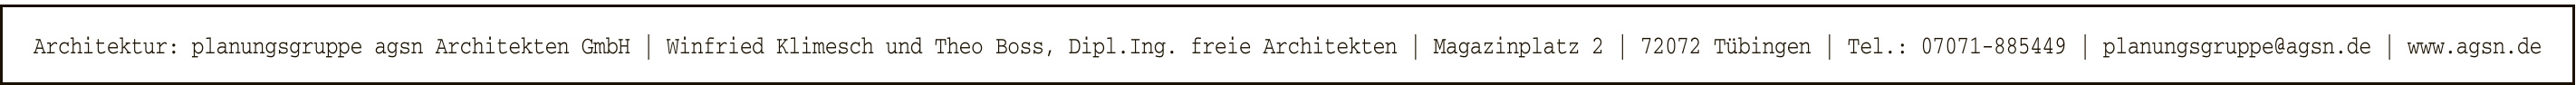 planungsgruppe agsn Architekten GmbH